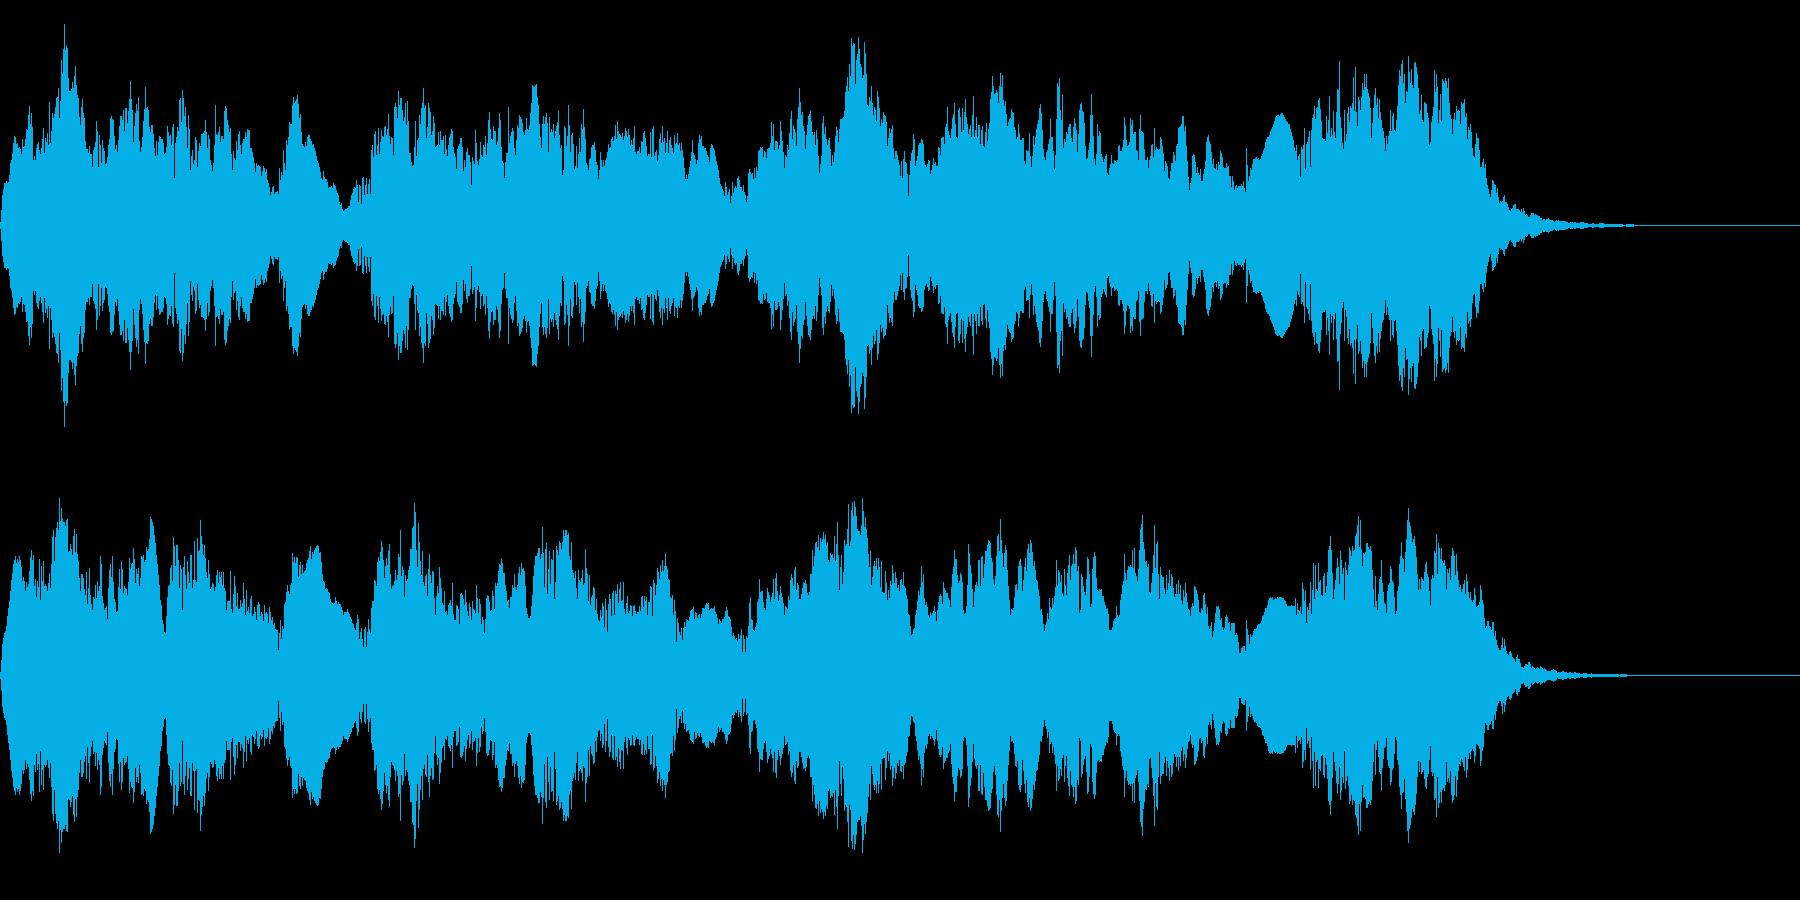 RPGのプロローグや回想シーンのような曲の再生済みの波形